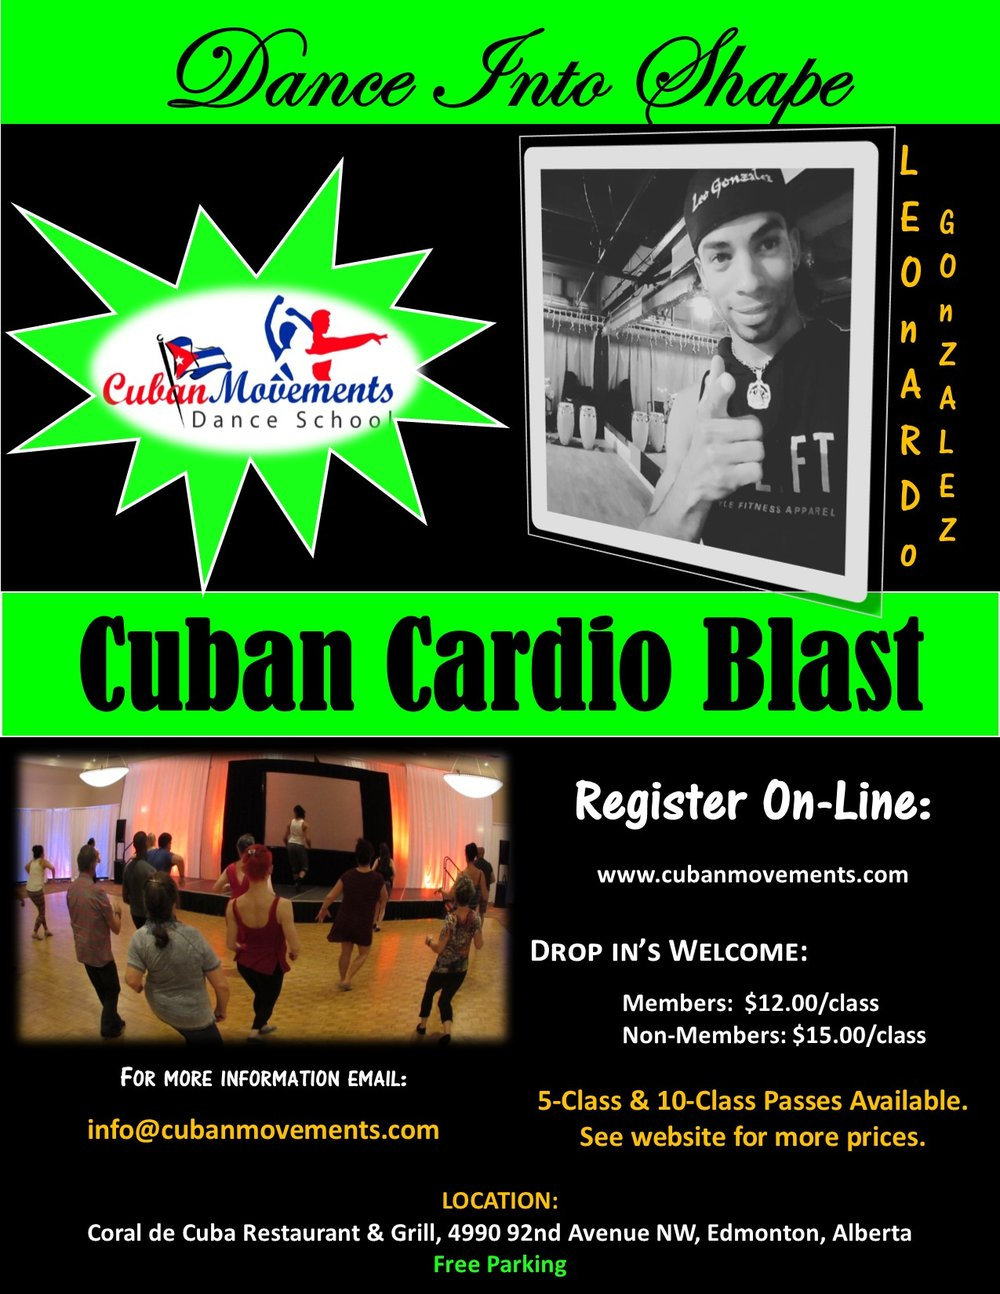 Cuban Cardio.jpg